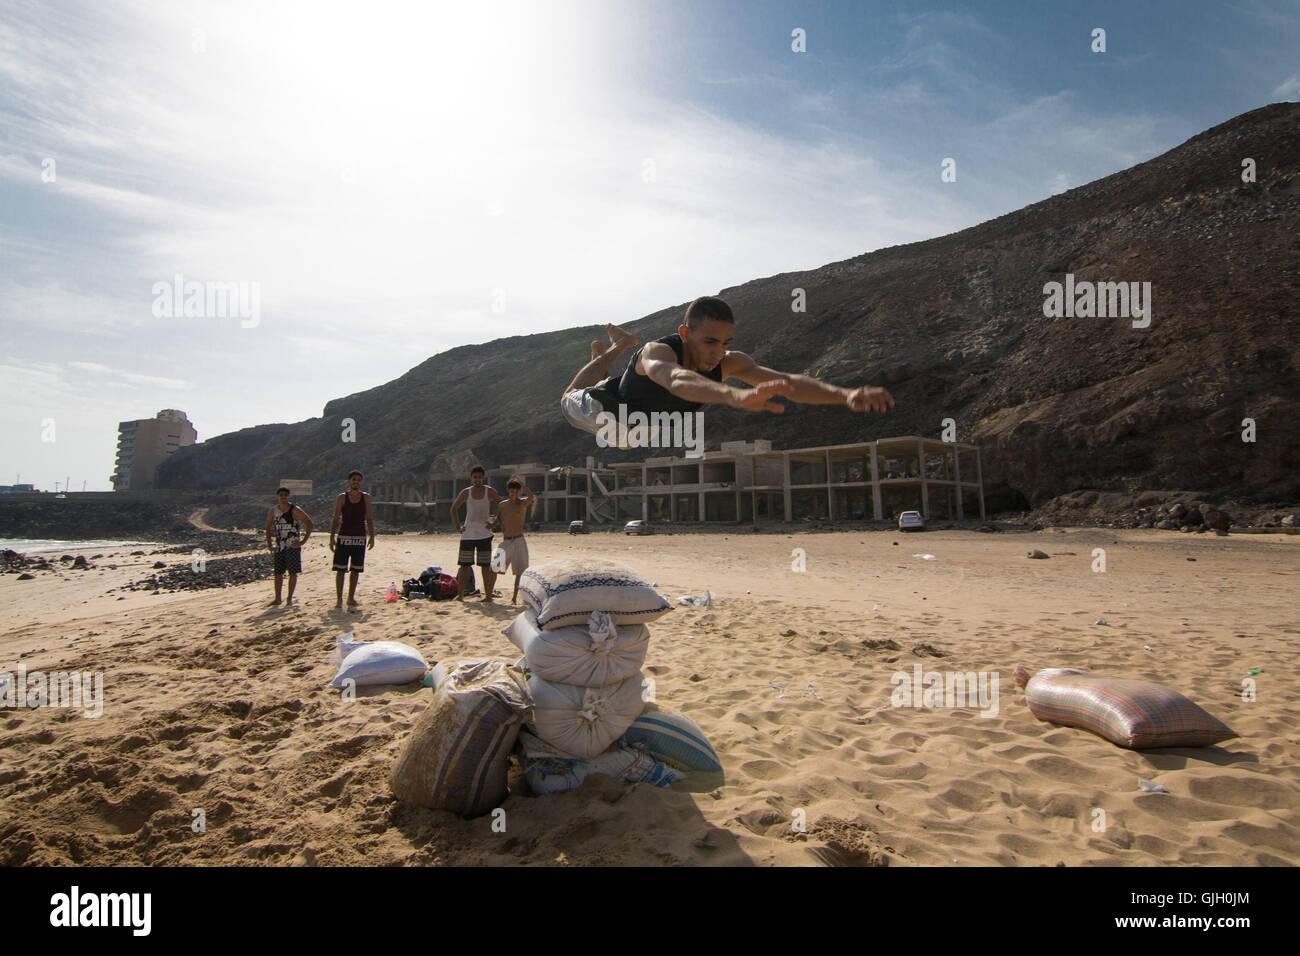 Aden, Yemen. 16th Aug, 2016. The Aden Freerun team practices parkour on Lover's Beach in Aden, Yemen © - Stock Image